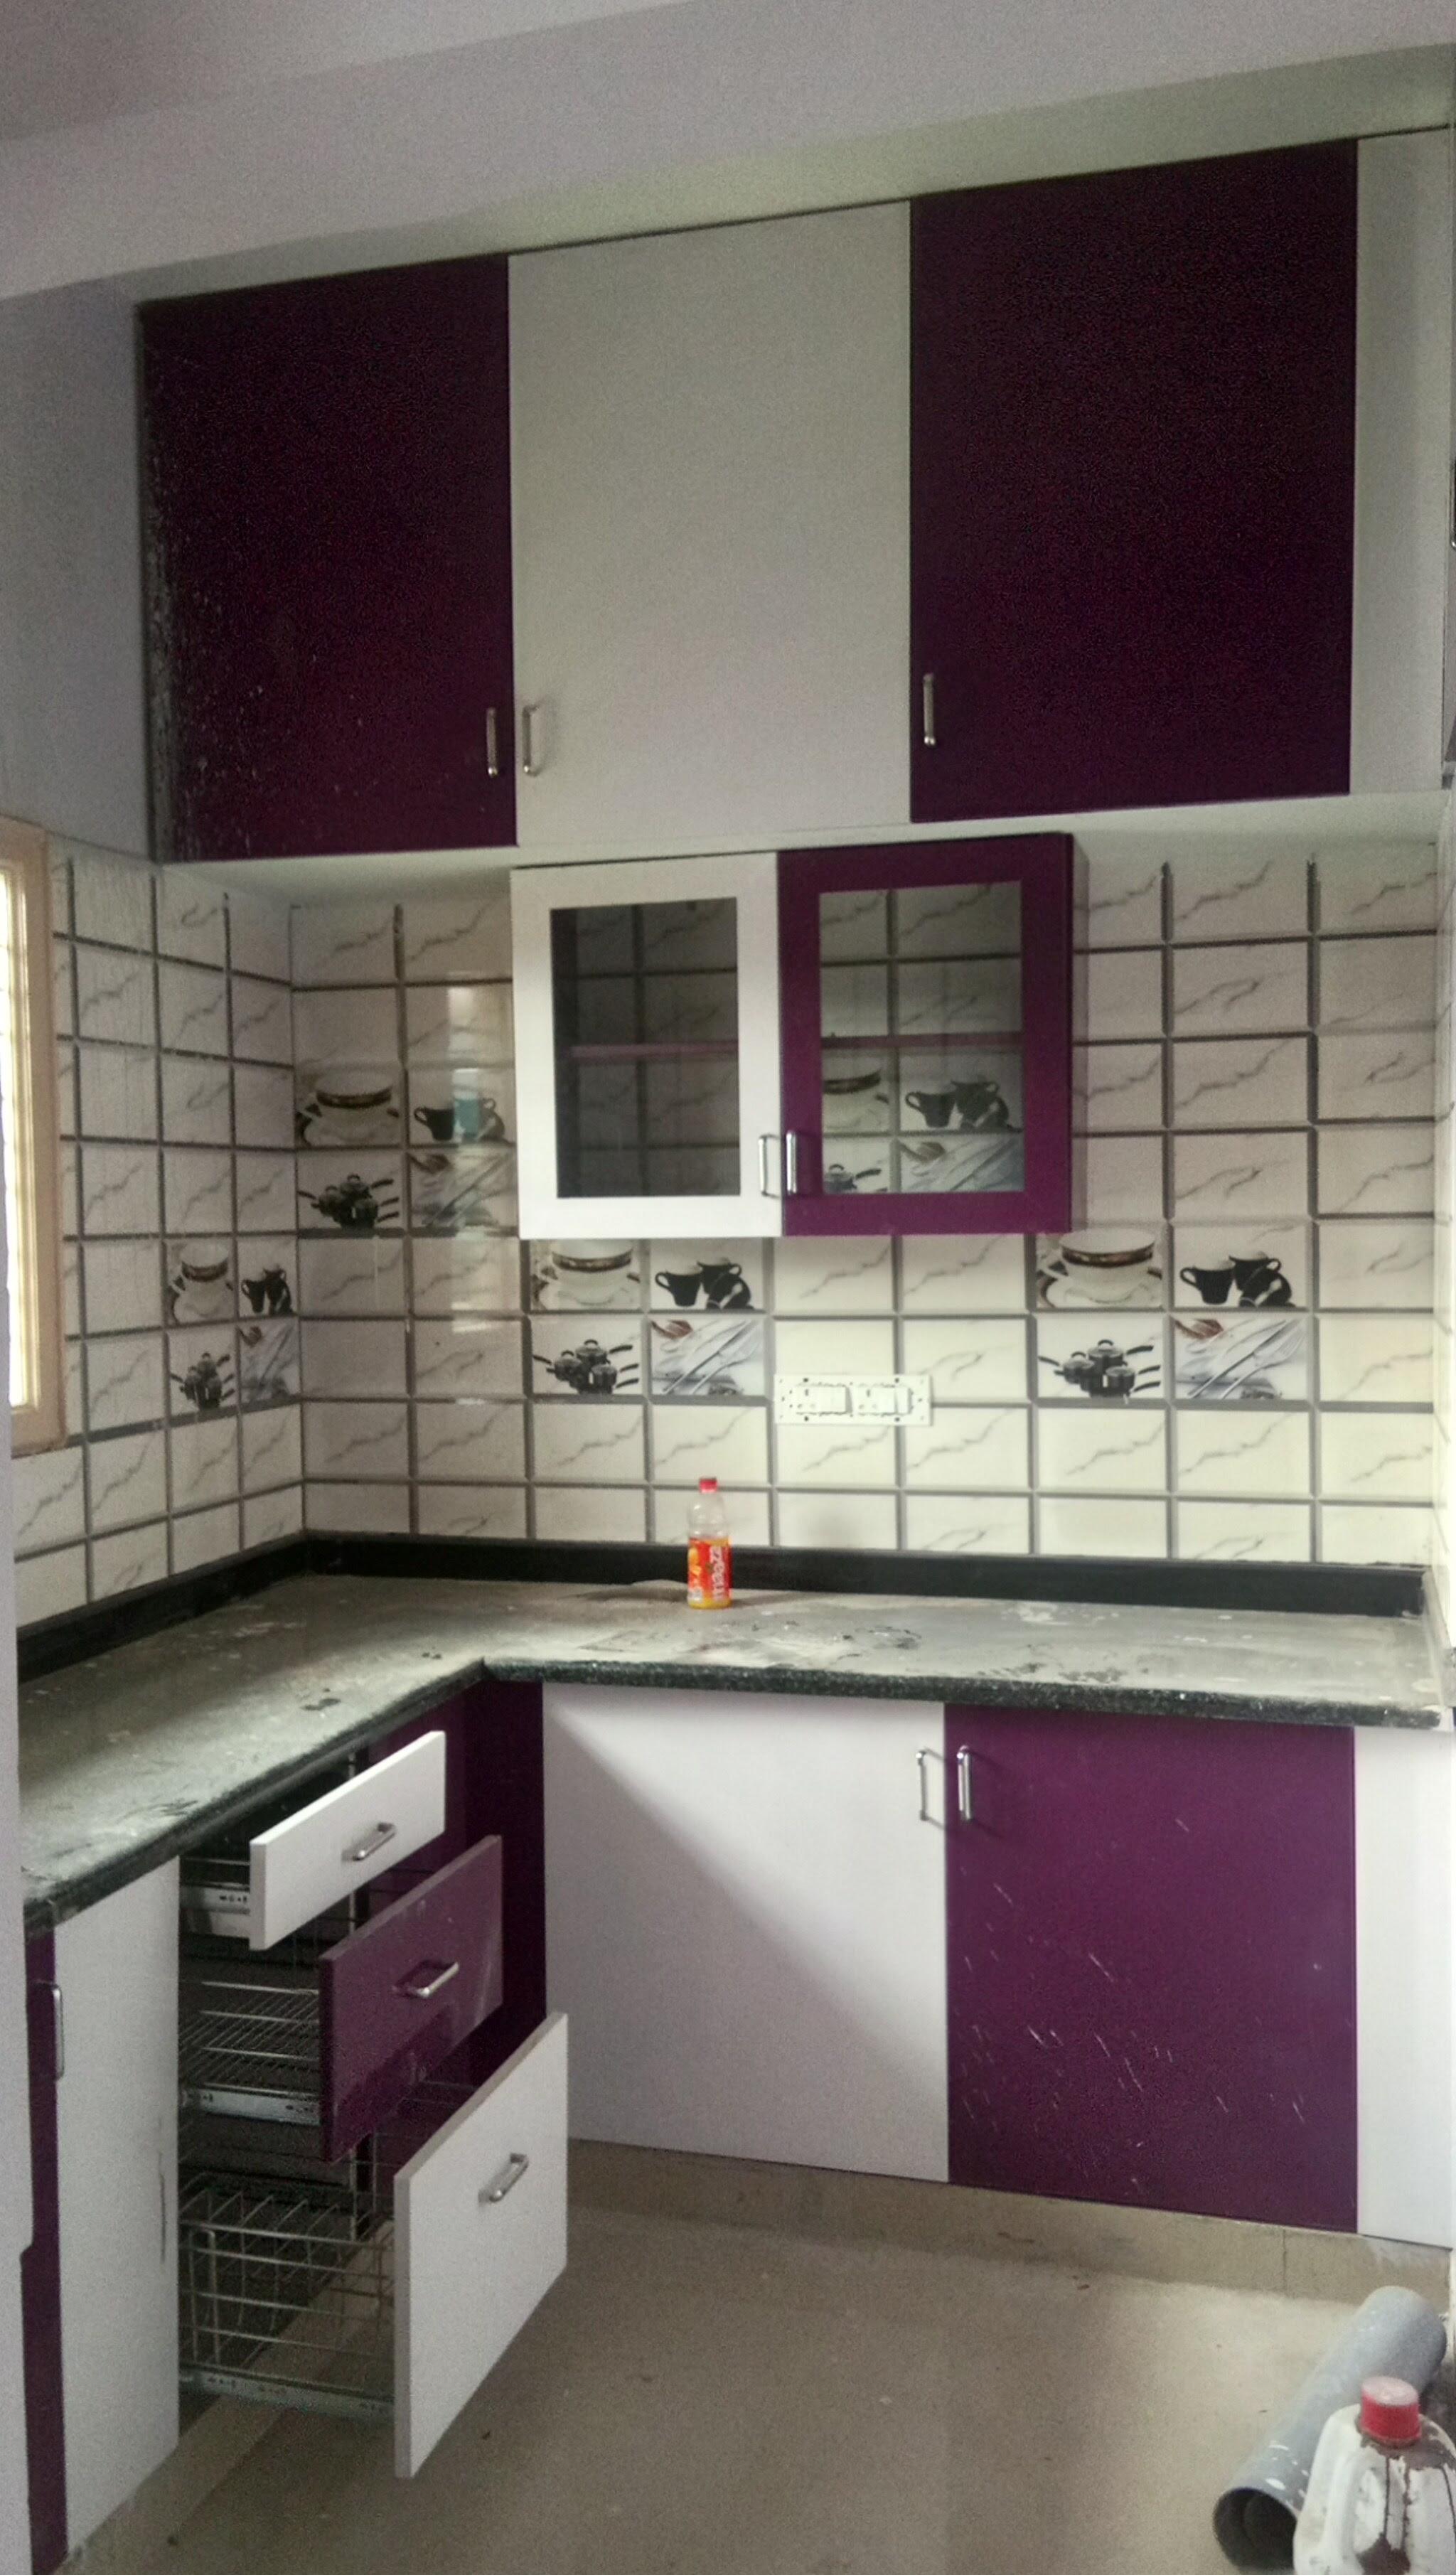 Catalogue Mithra Pvc Modular Kitchen Cabinets Interior Design In Bangalore Justdial